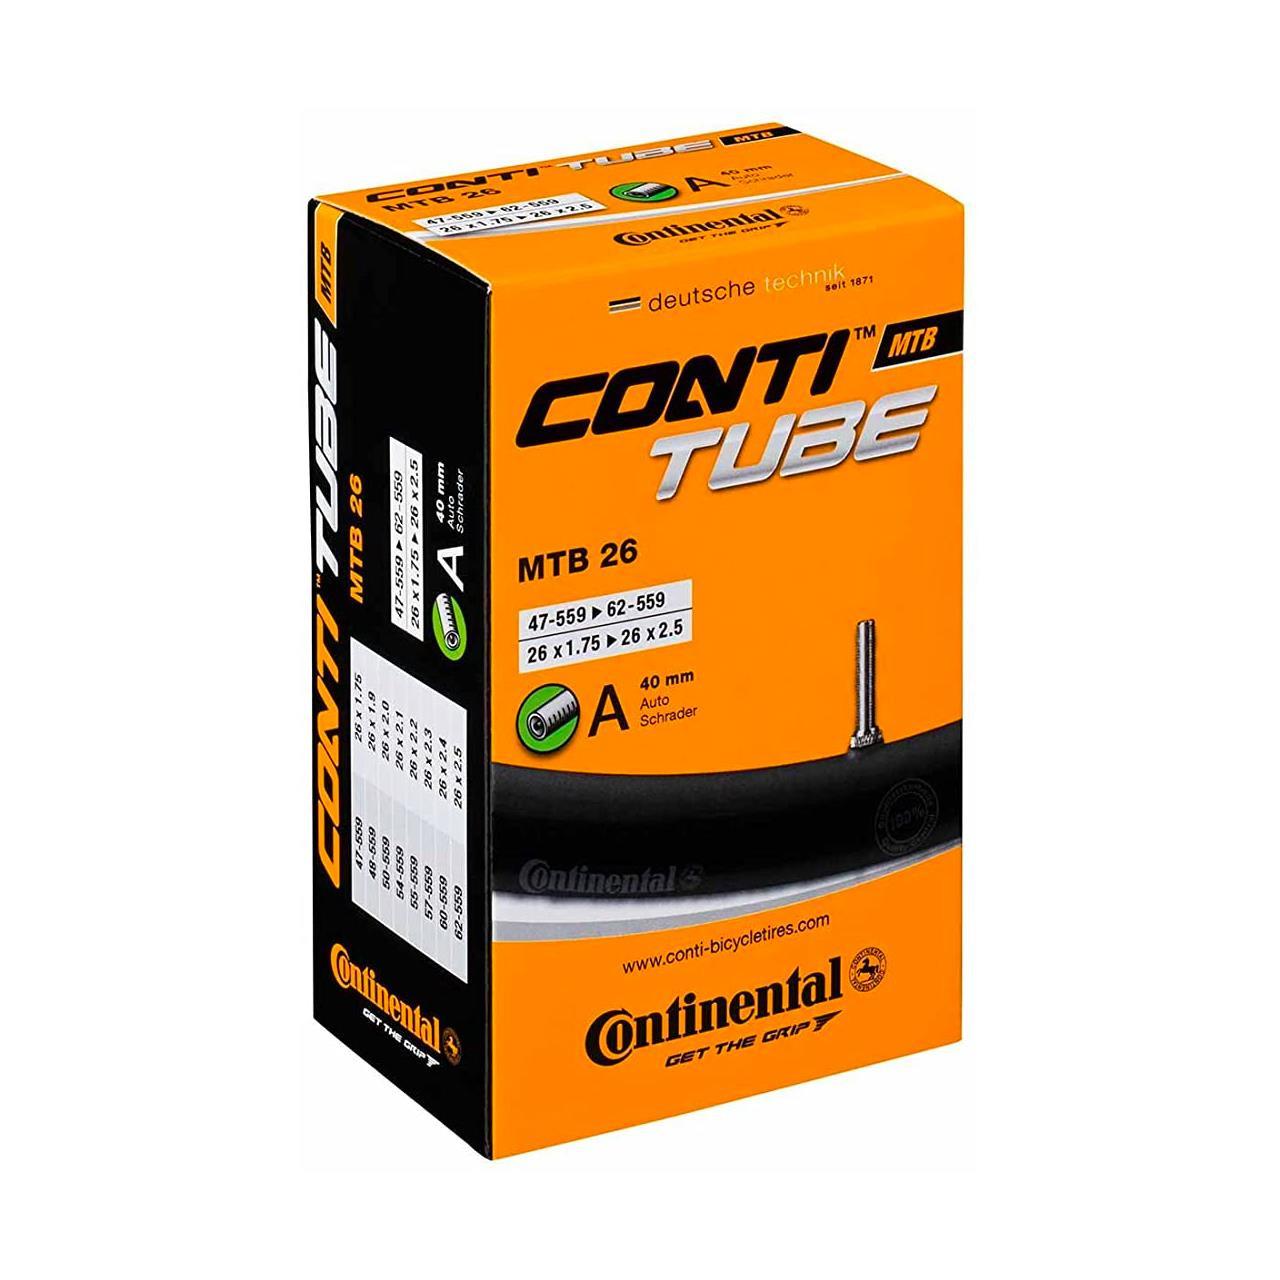 Continental Inner Tube (Schrader Valve MTB 26 X 1.75 - 2.5 inch)